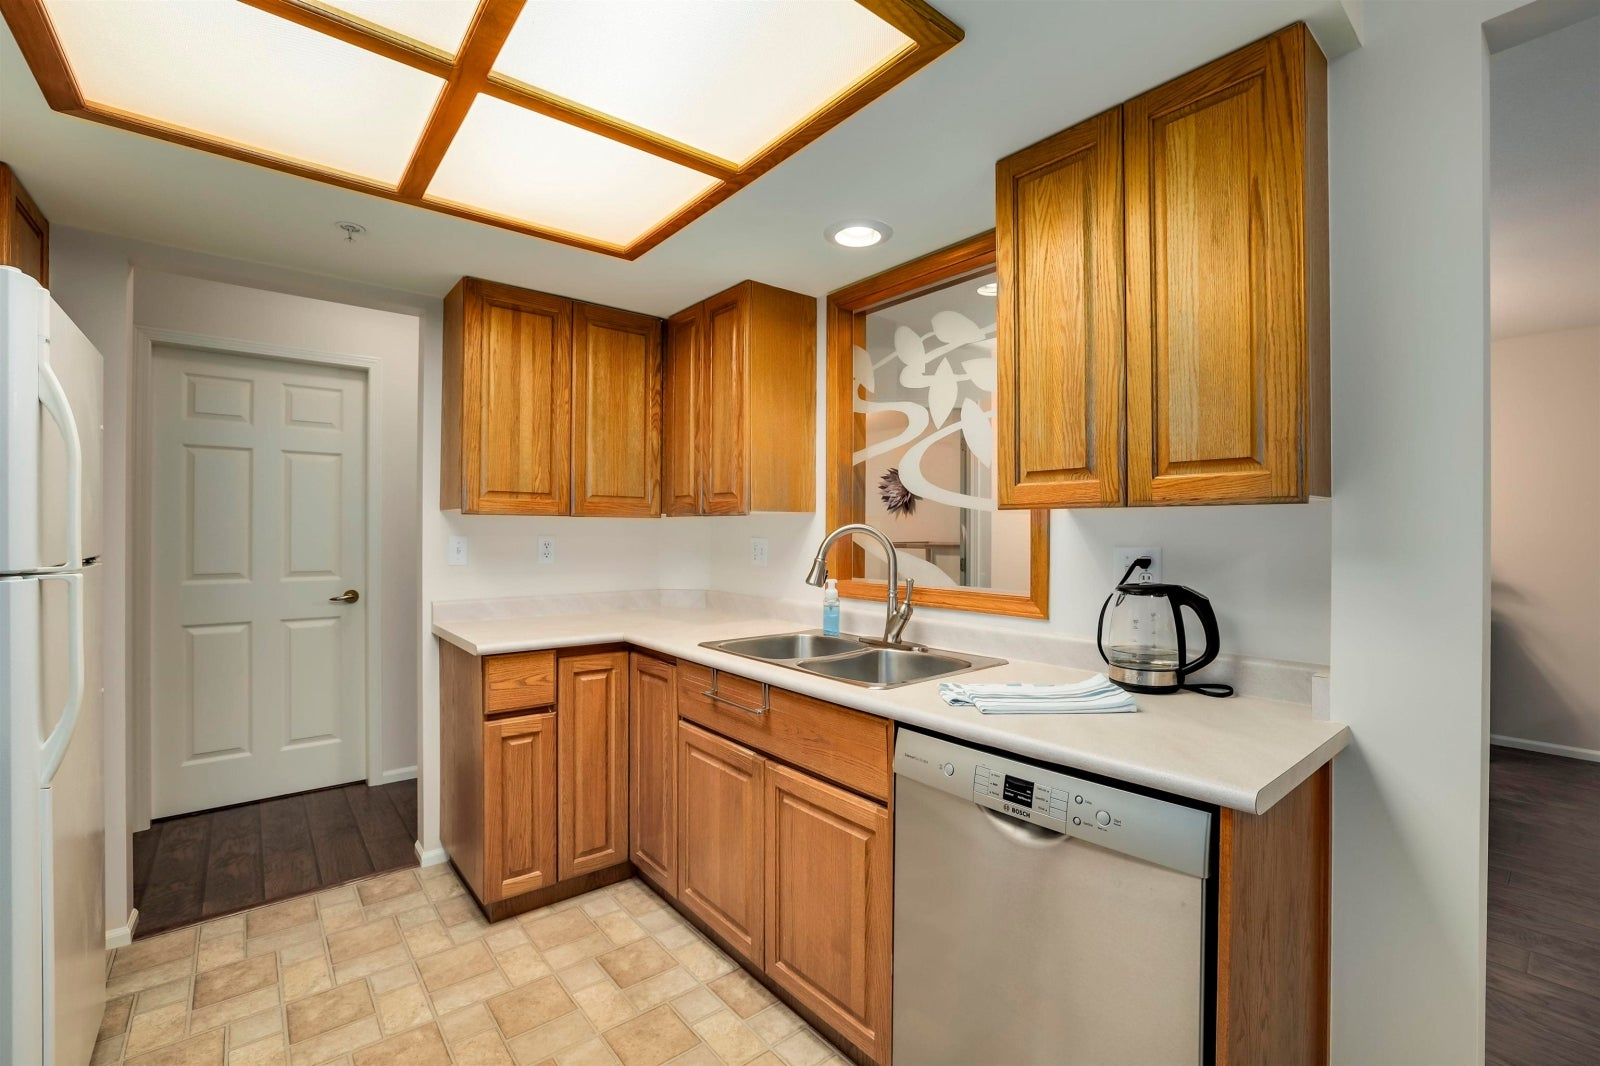 103 1132 DUFFERIN STREET - Eagle Ridge CQ Apartment/Condo for sale, 2 Bedrooms (R2618654) #9